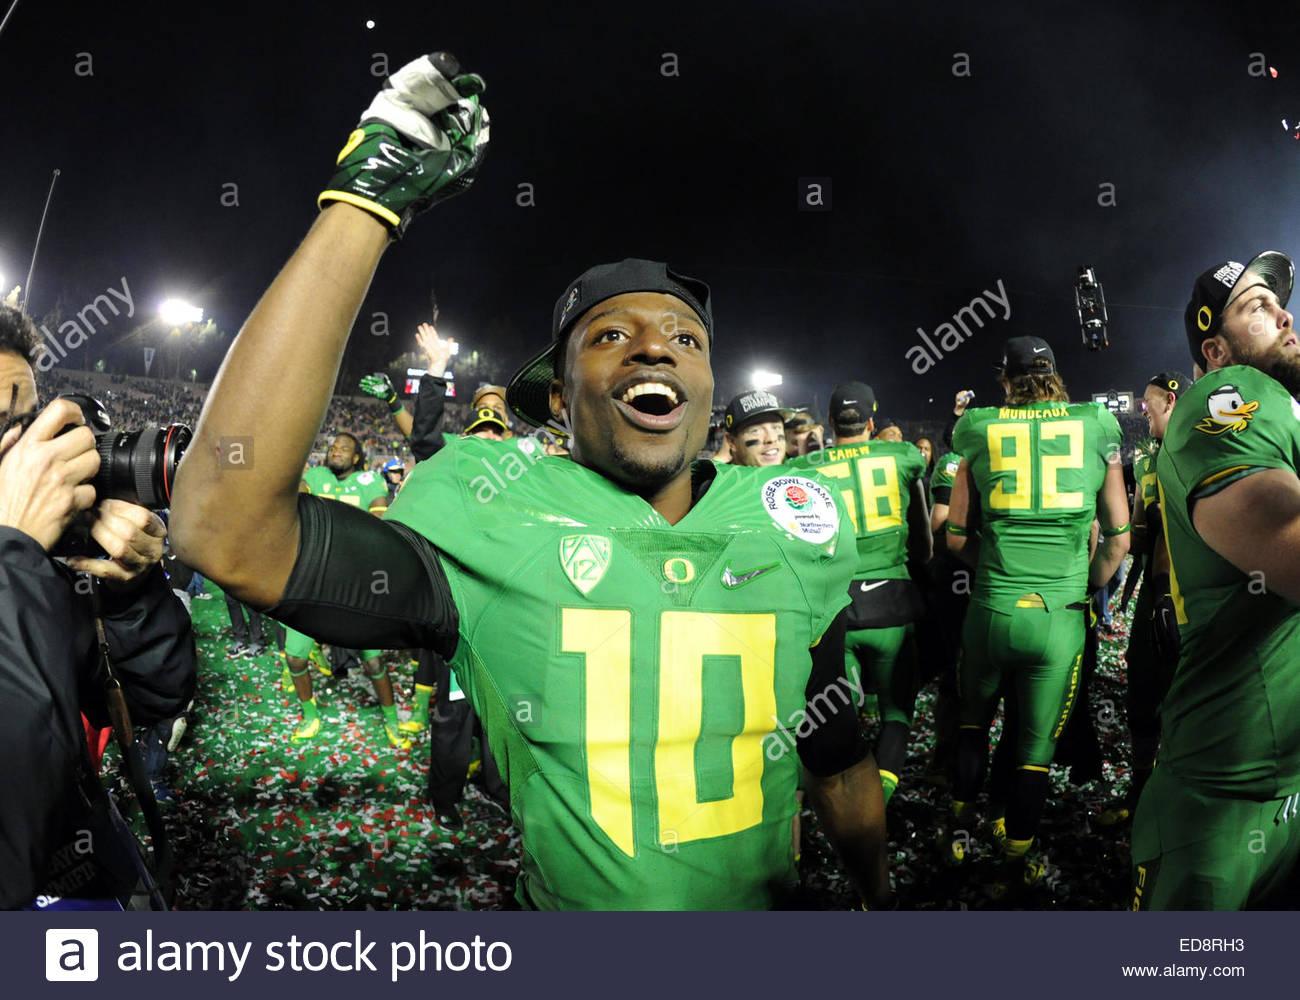 Pasadena, California, USA. 01st Jan, 2015. Oregon Ducks's Johnathan Loyd celebrates after defeating the Florida - Stock Image